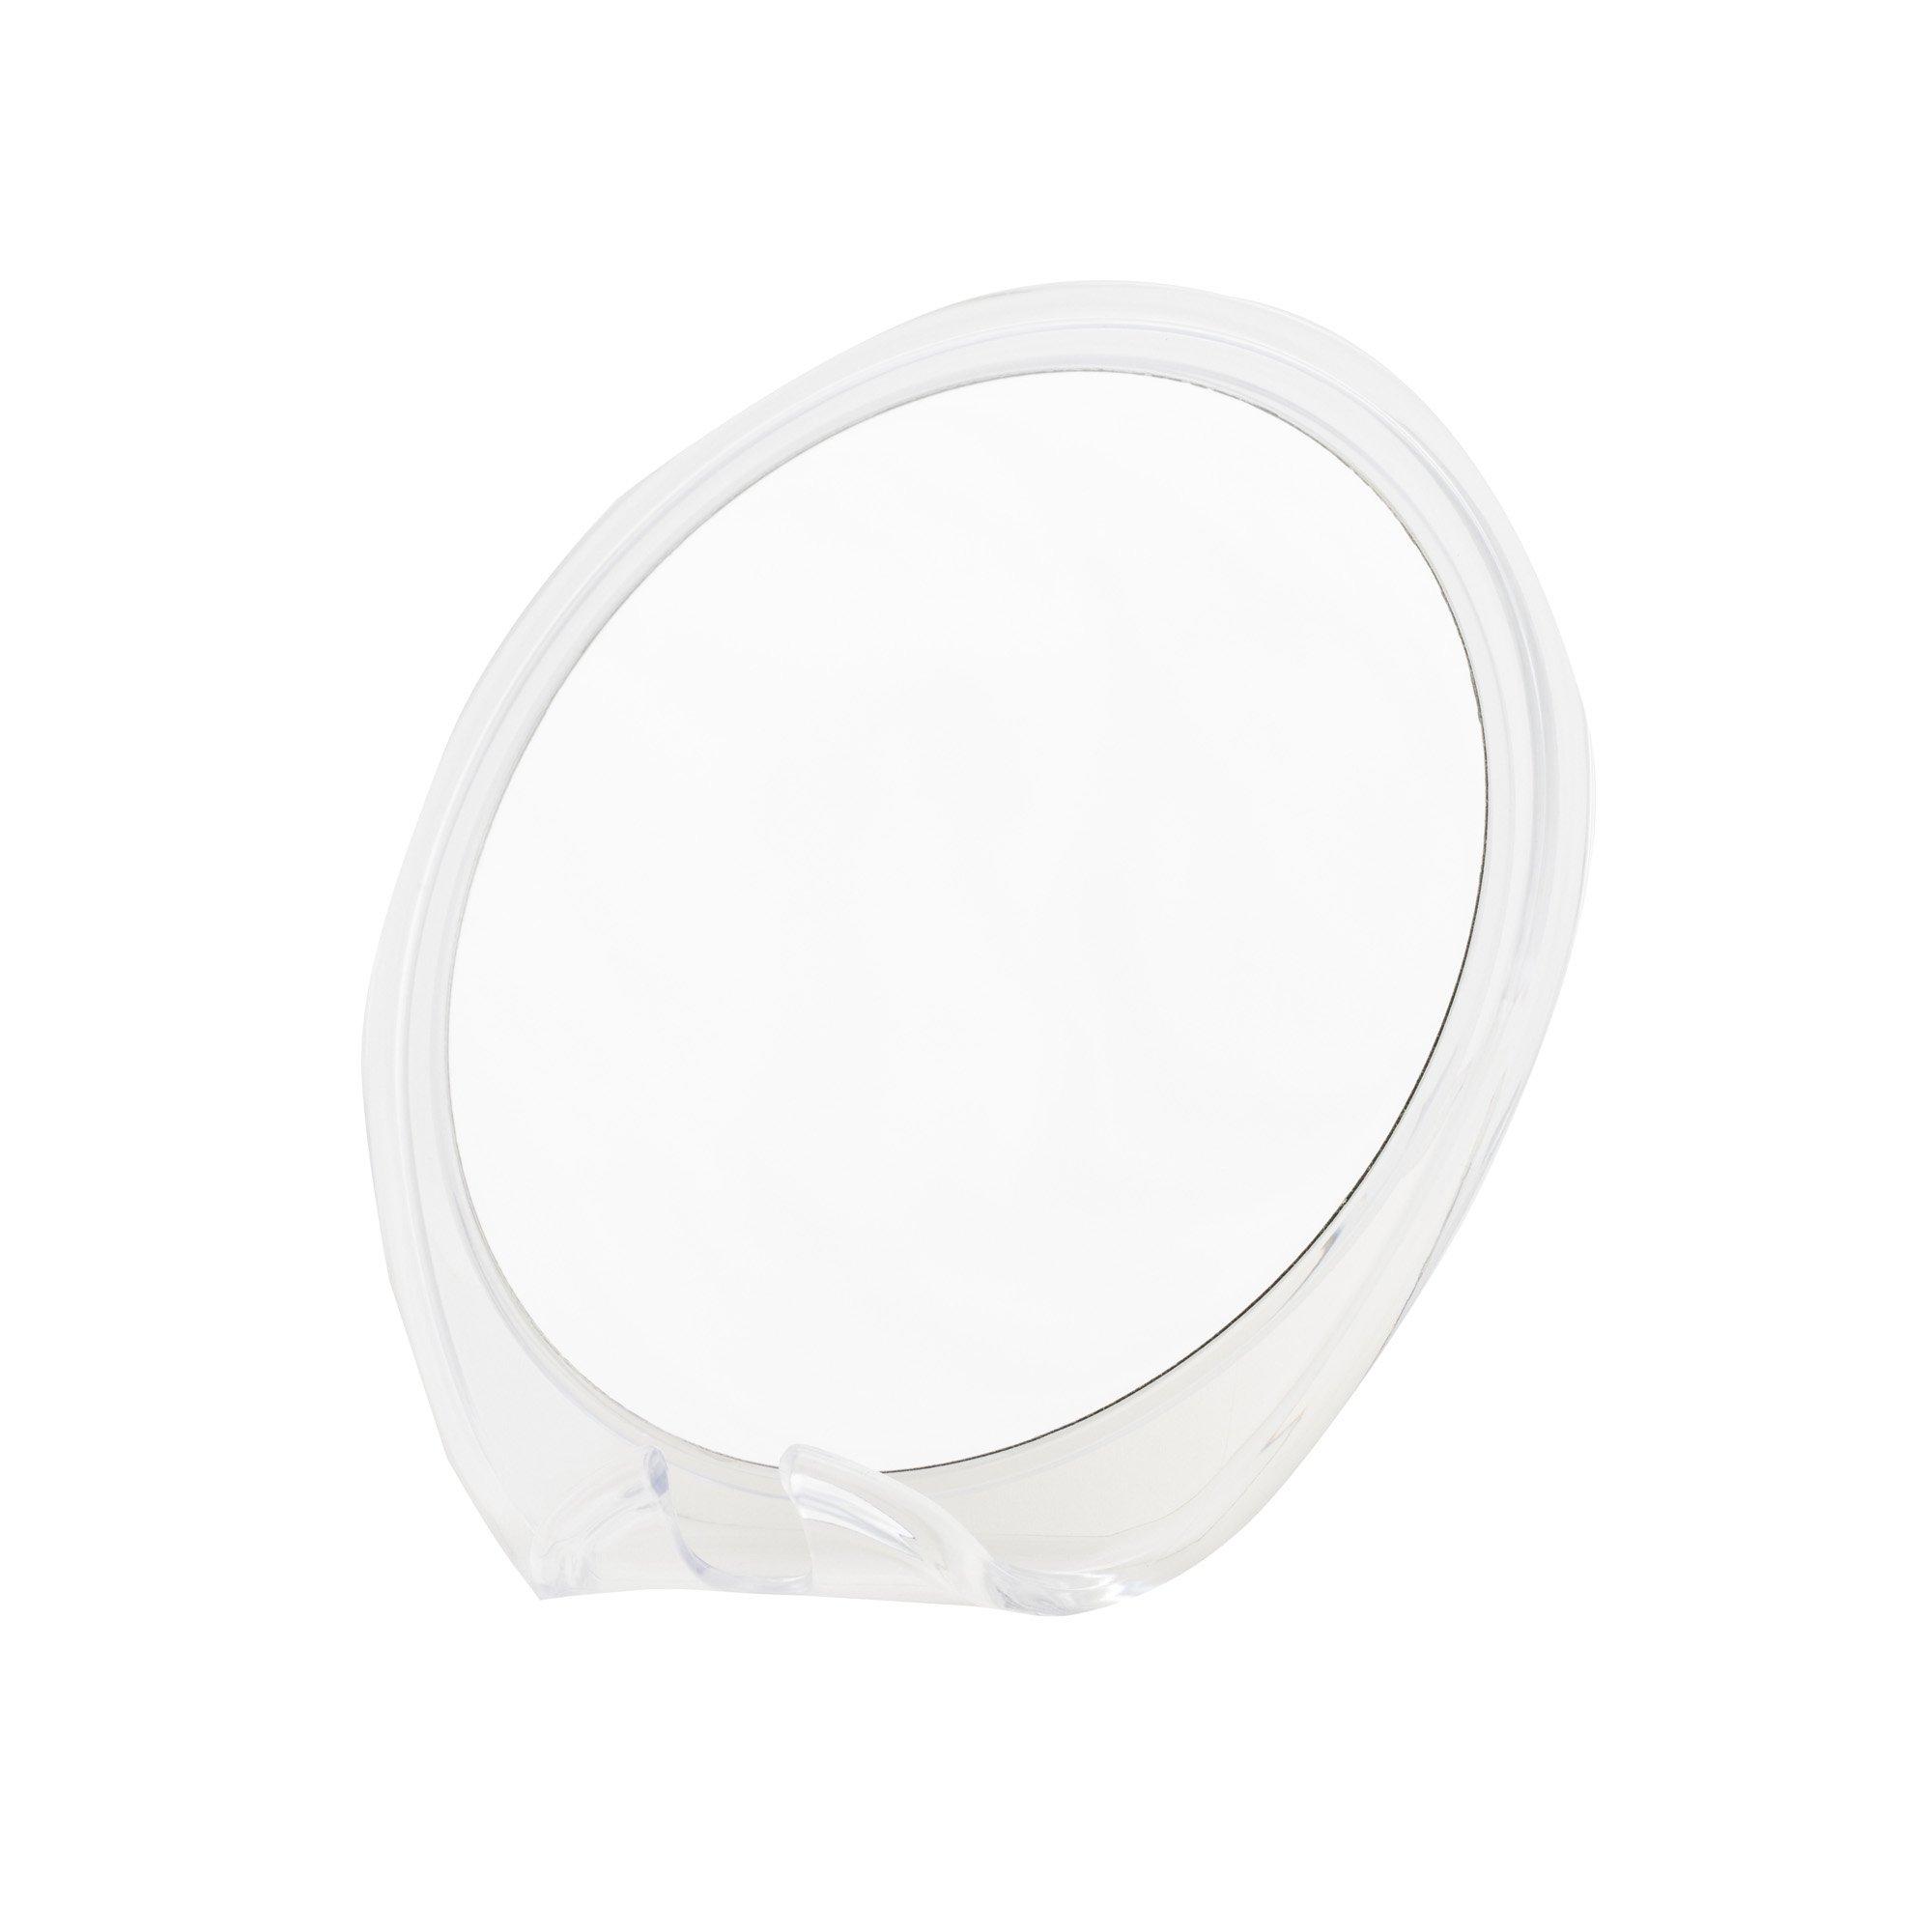 Danielle Super Suction Fogless Shaving Mirror with Razor Stand, 5X Magnification